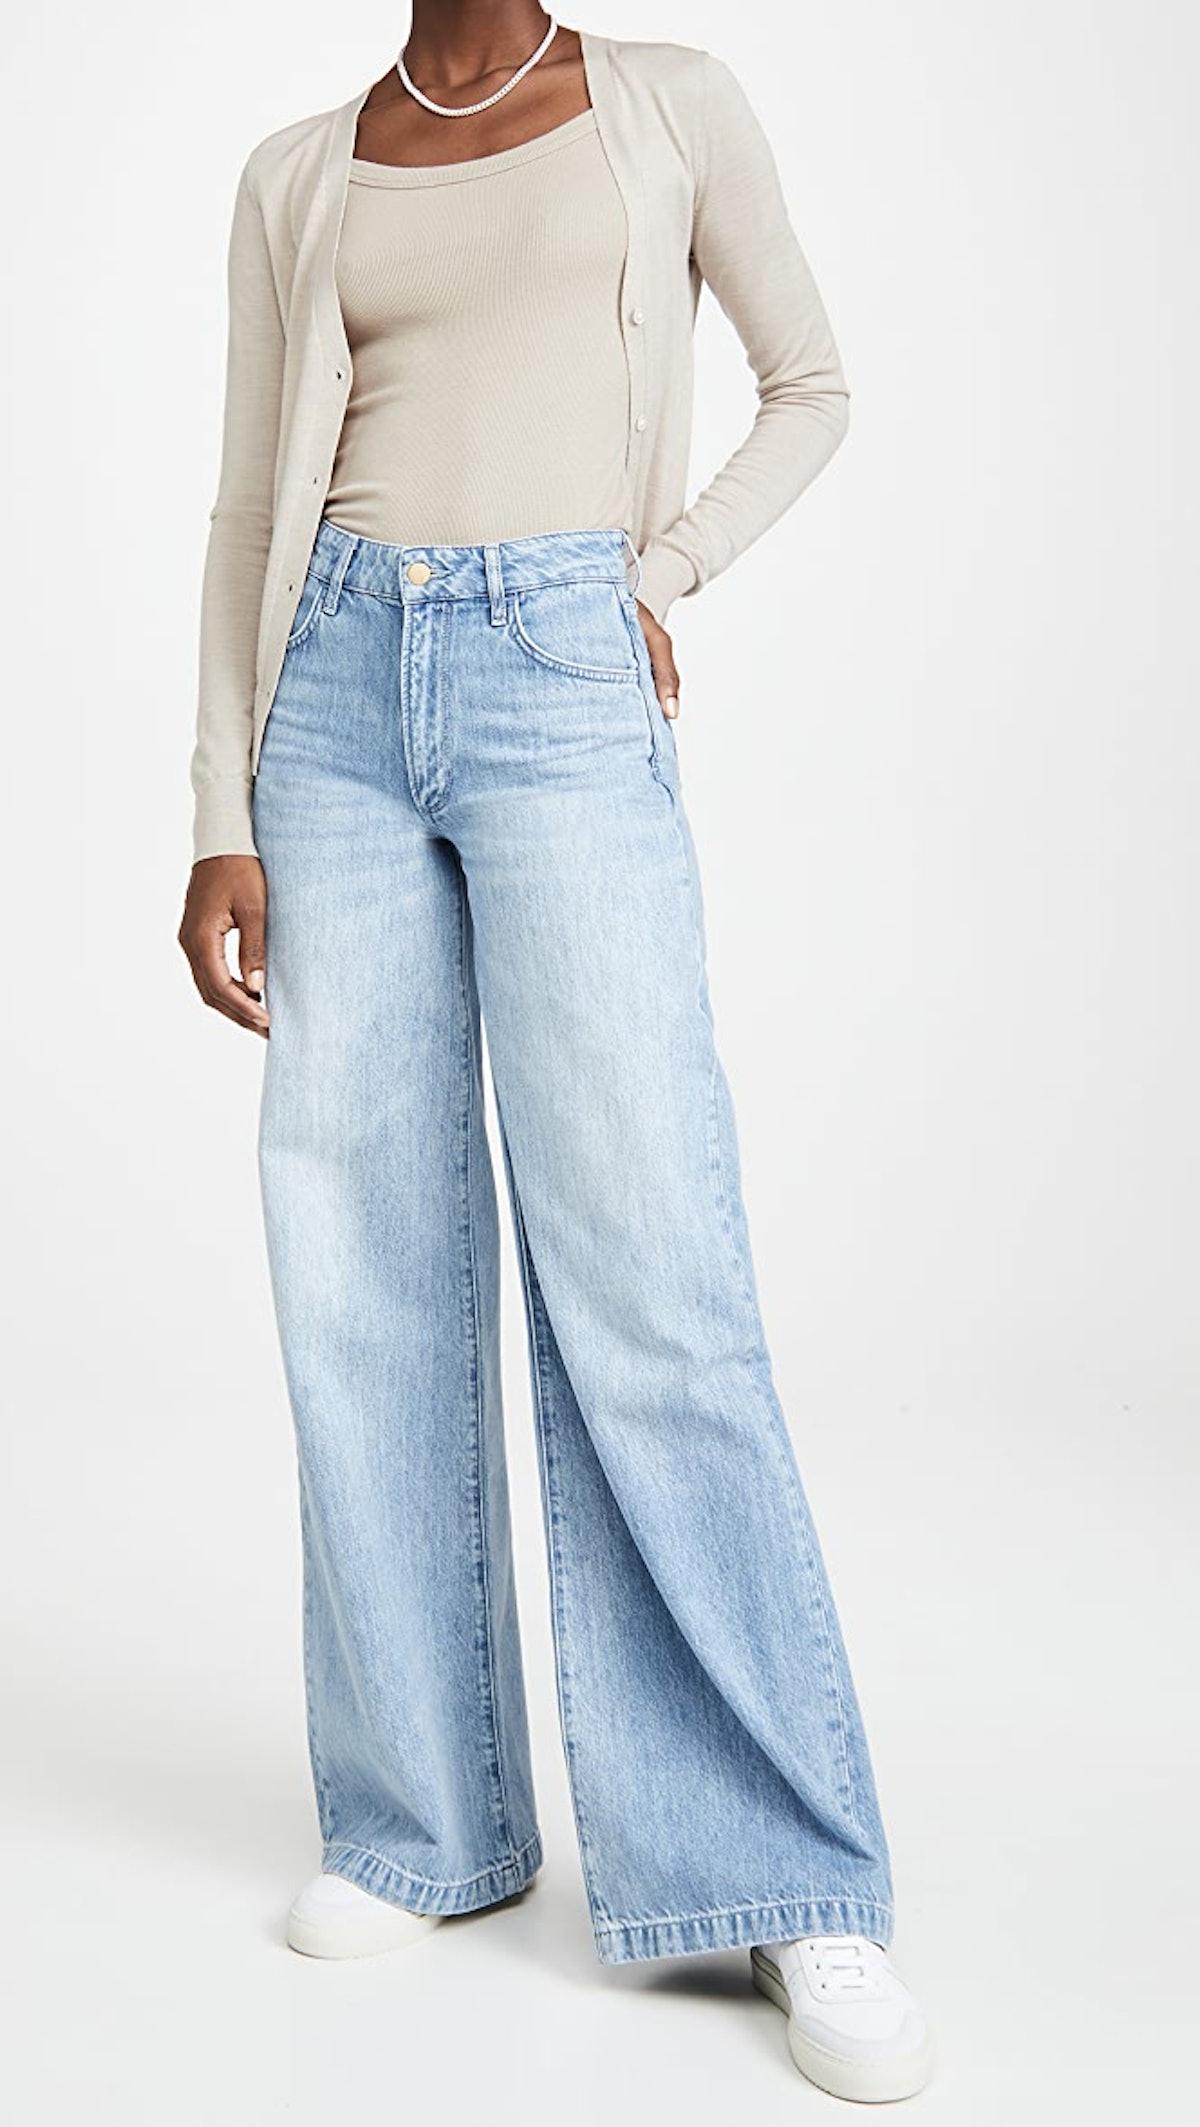 Women's High Rise Wide Leg Jeans